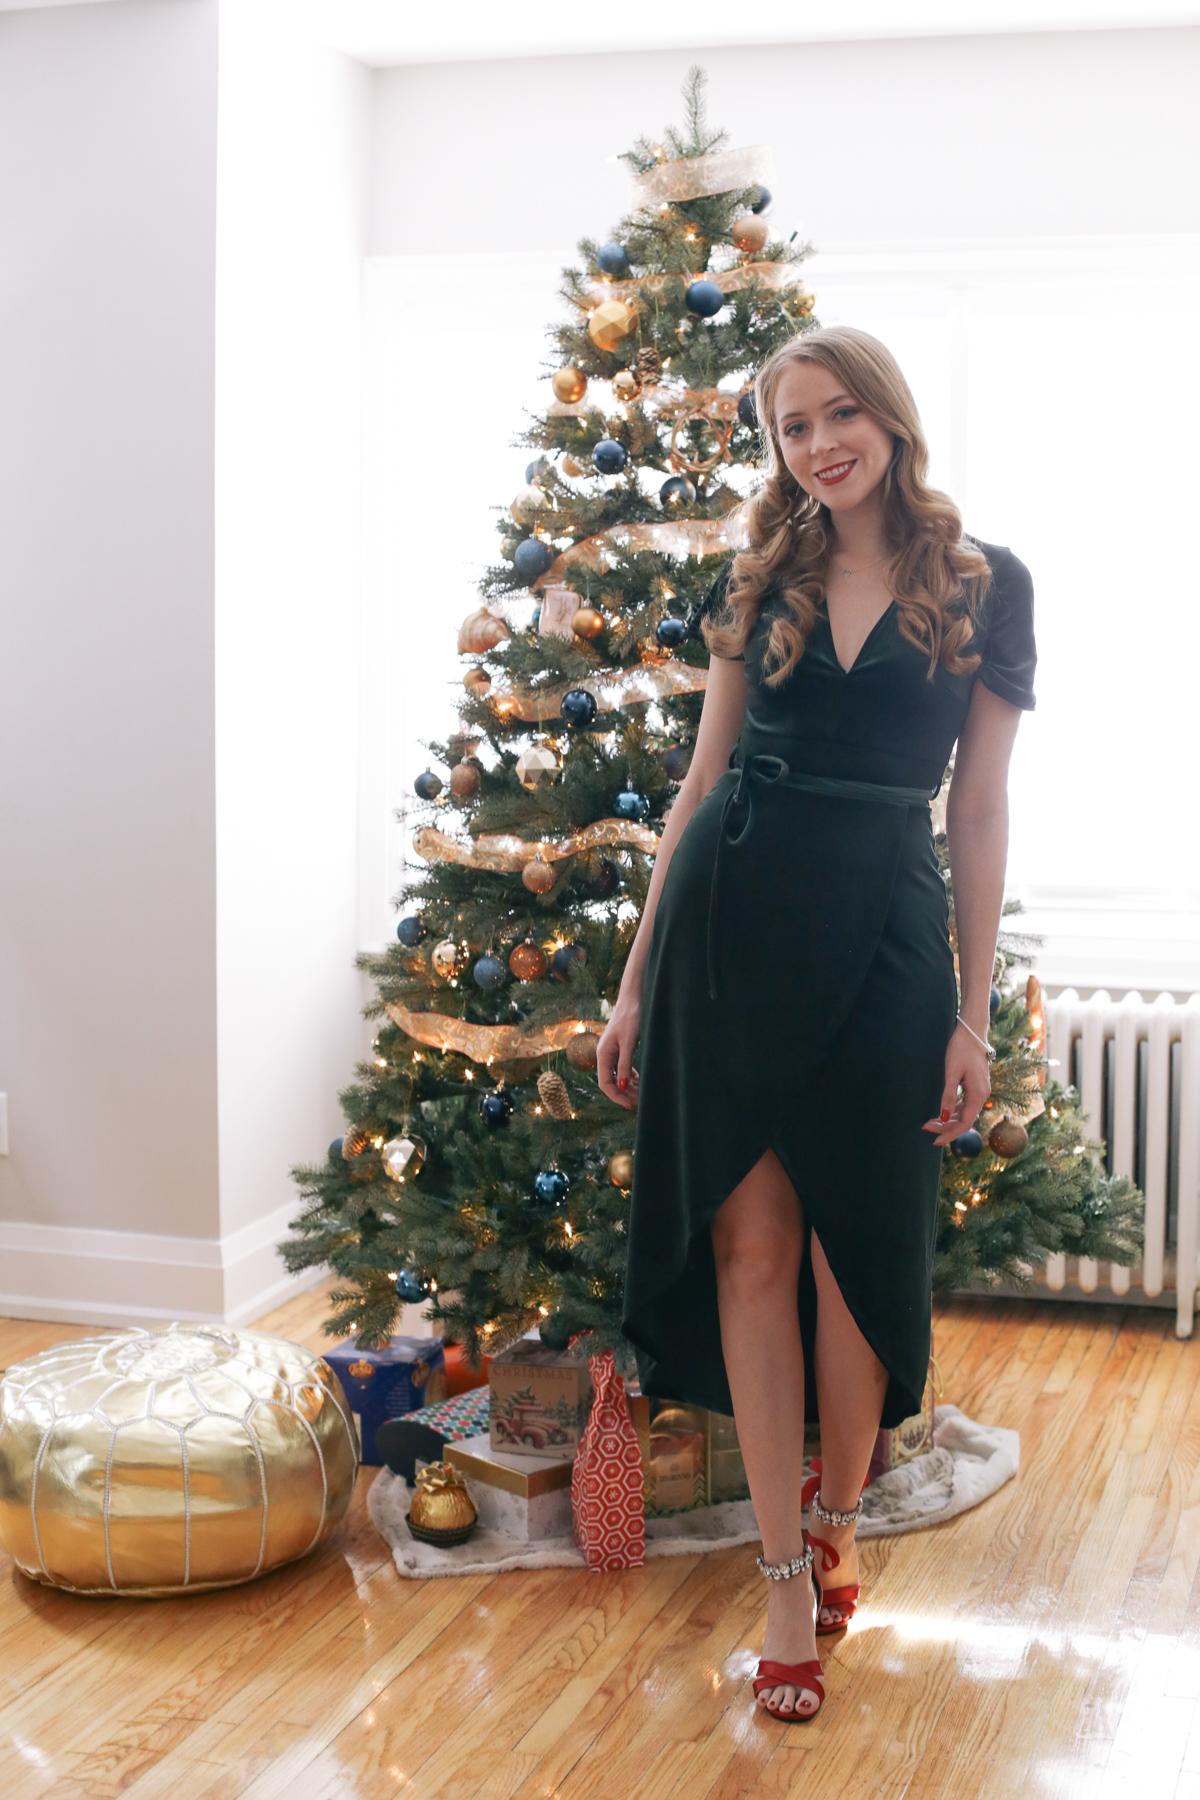 Christmas Eve outfit idea